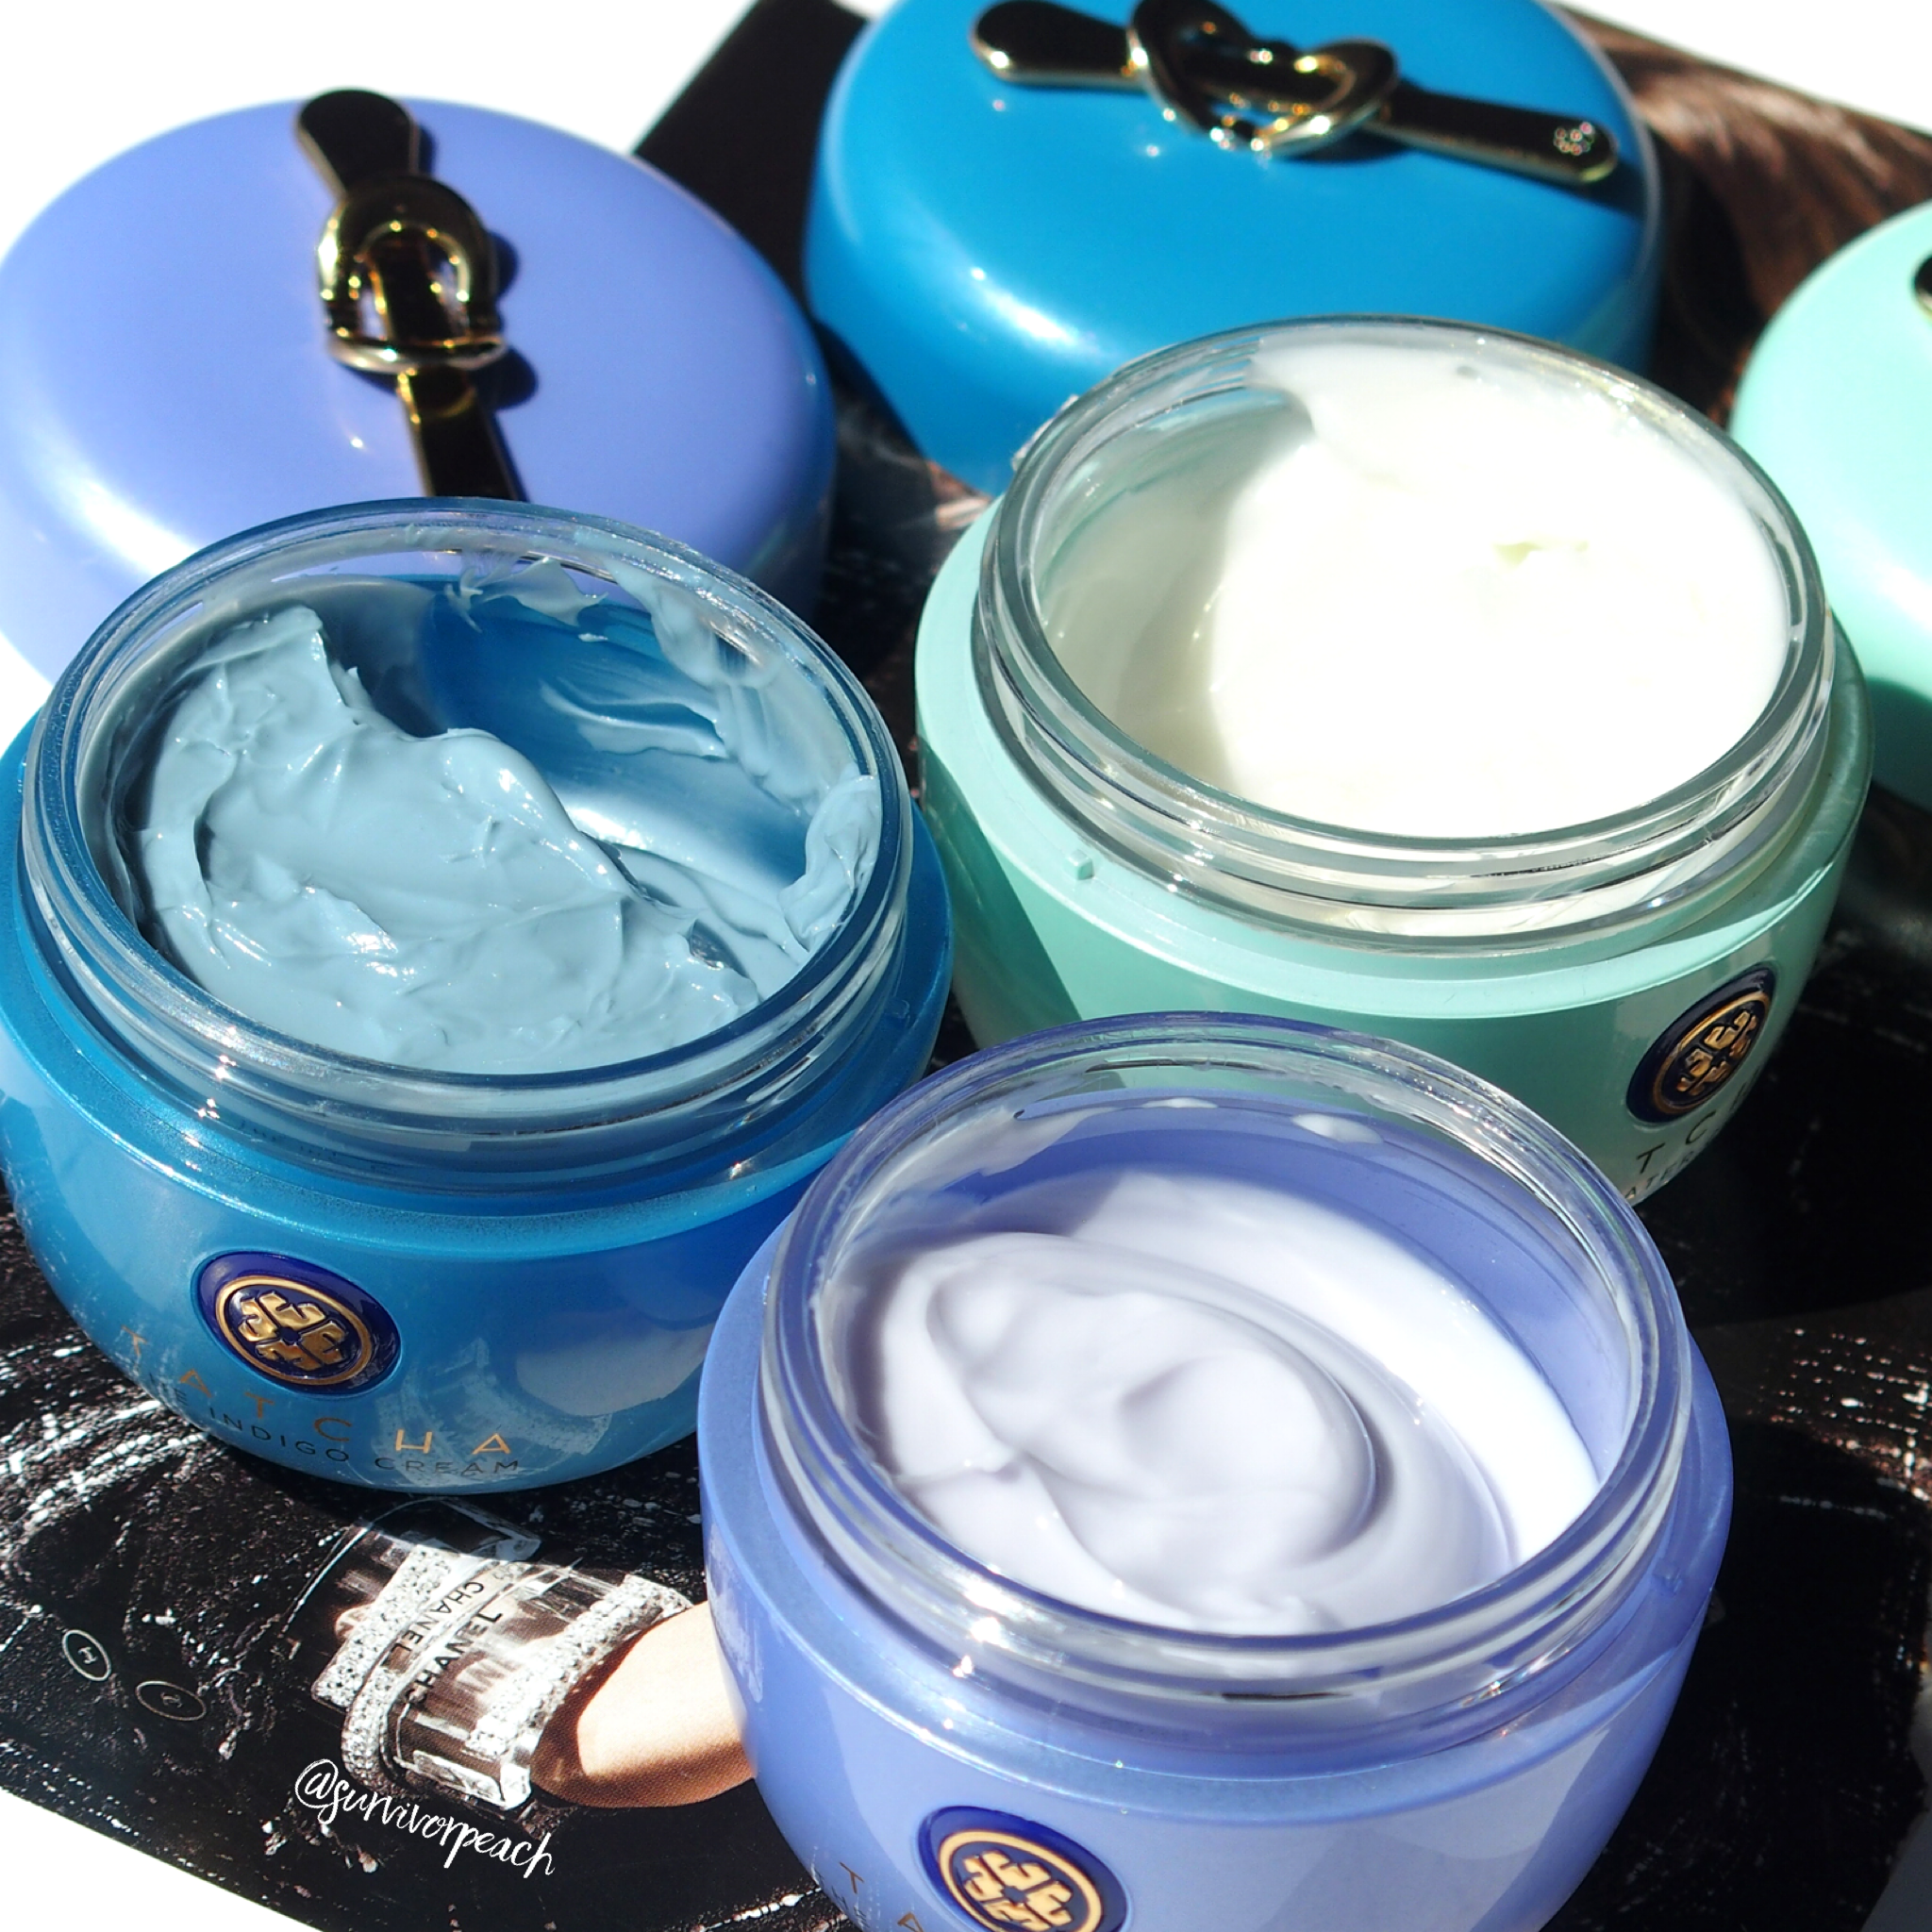 Tatcha Creams : The Water Cream, the Dewy Skin Cream, the Indigo Cream